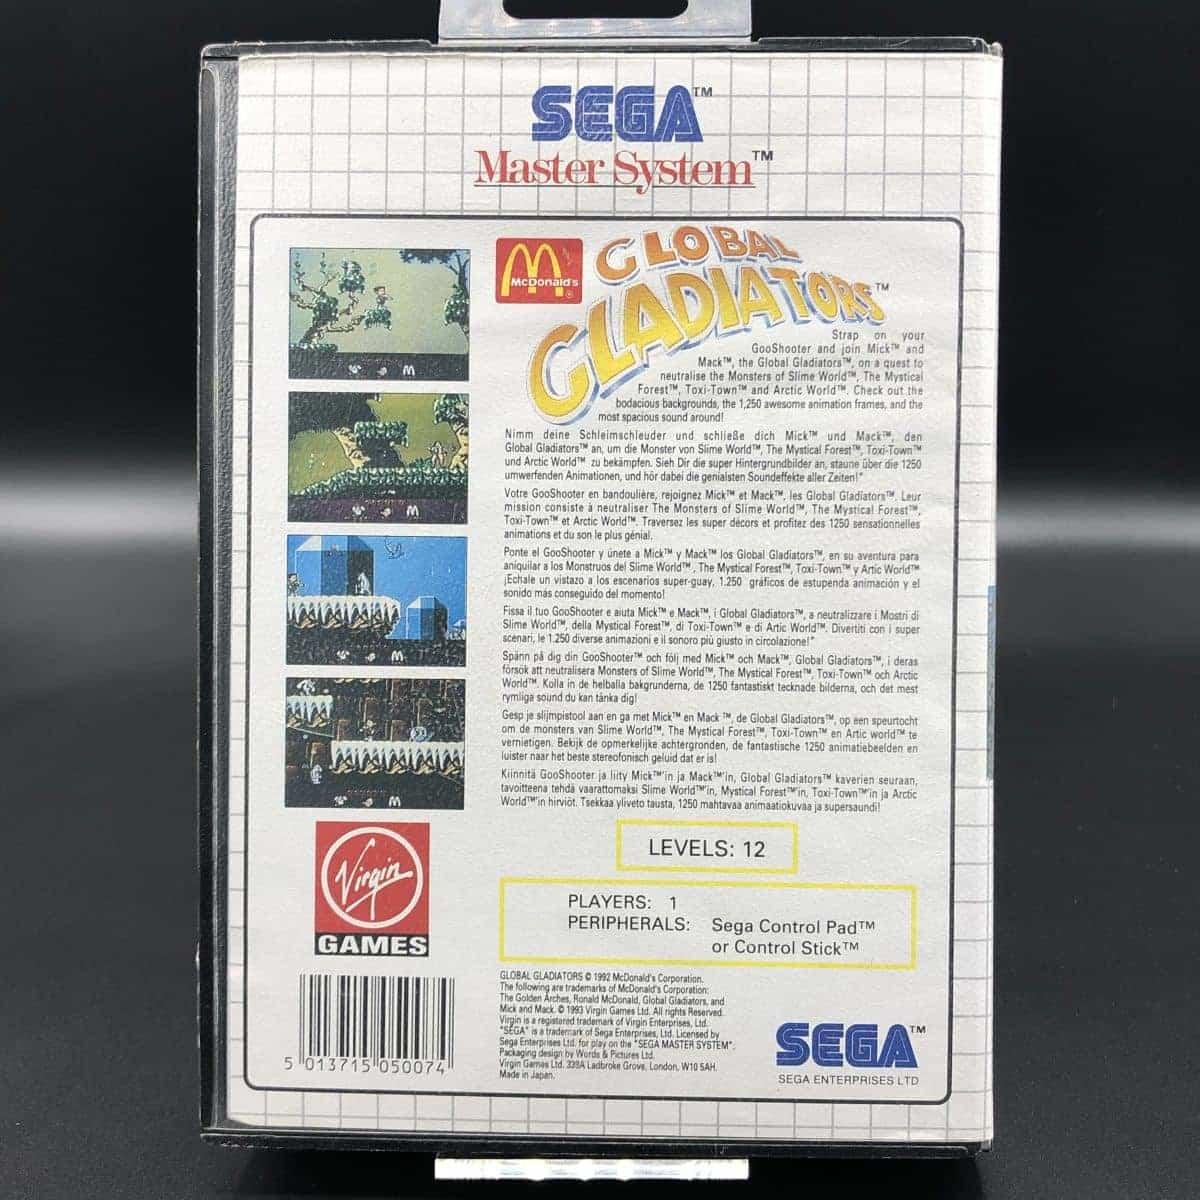 Global Gladiators (Komplett) (Gut) Sega Master System